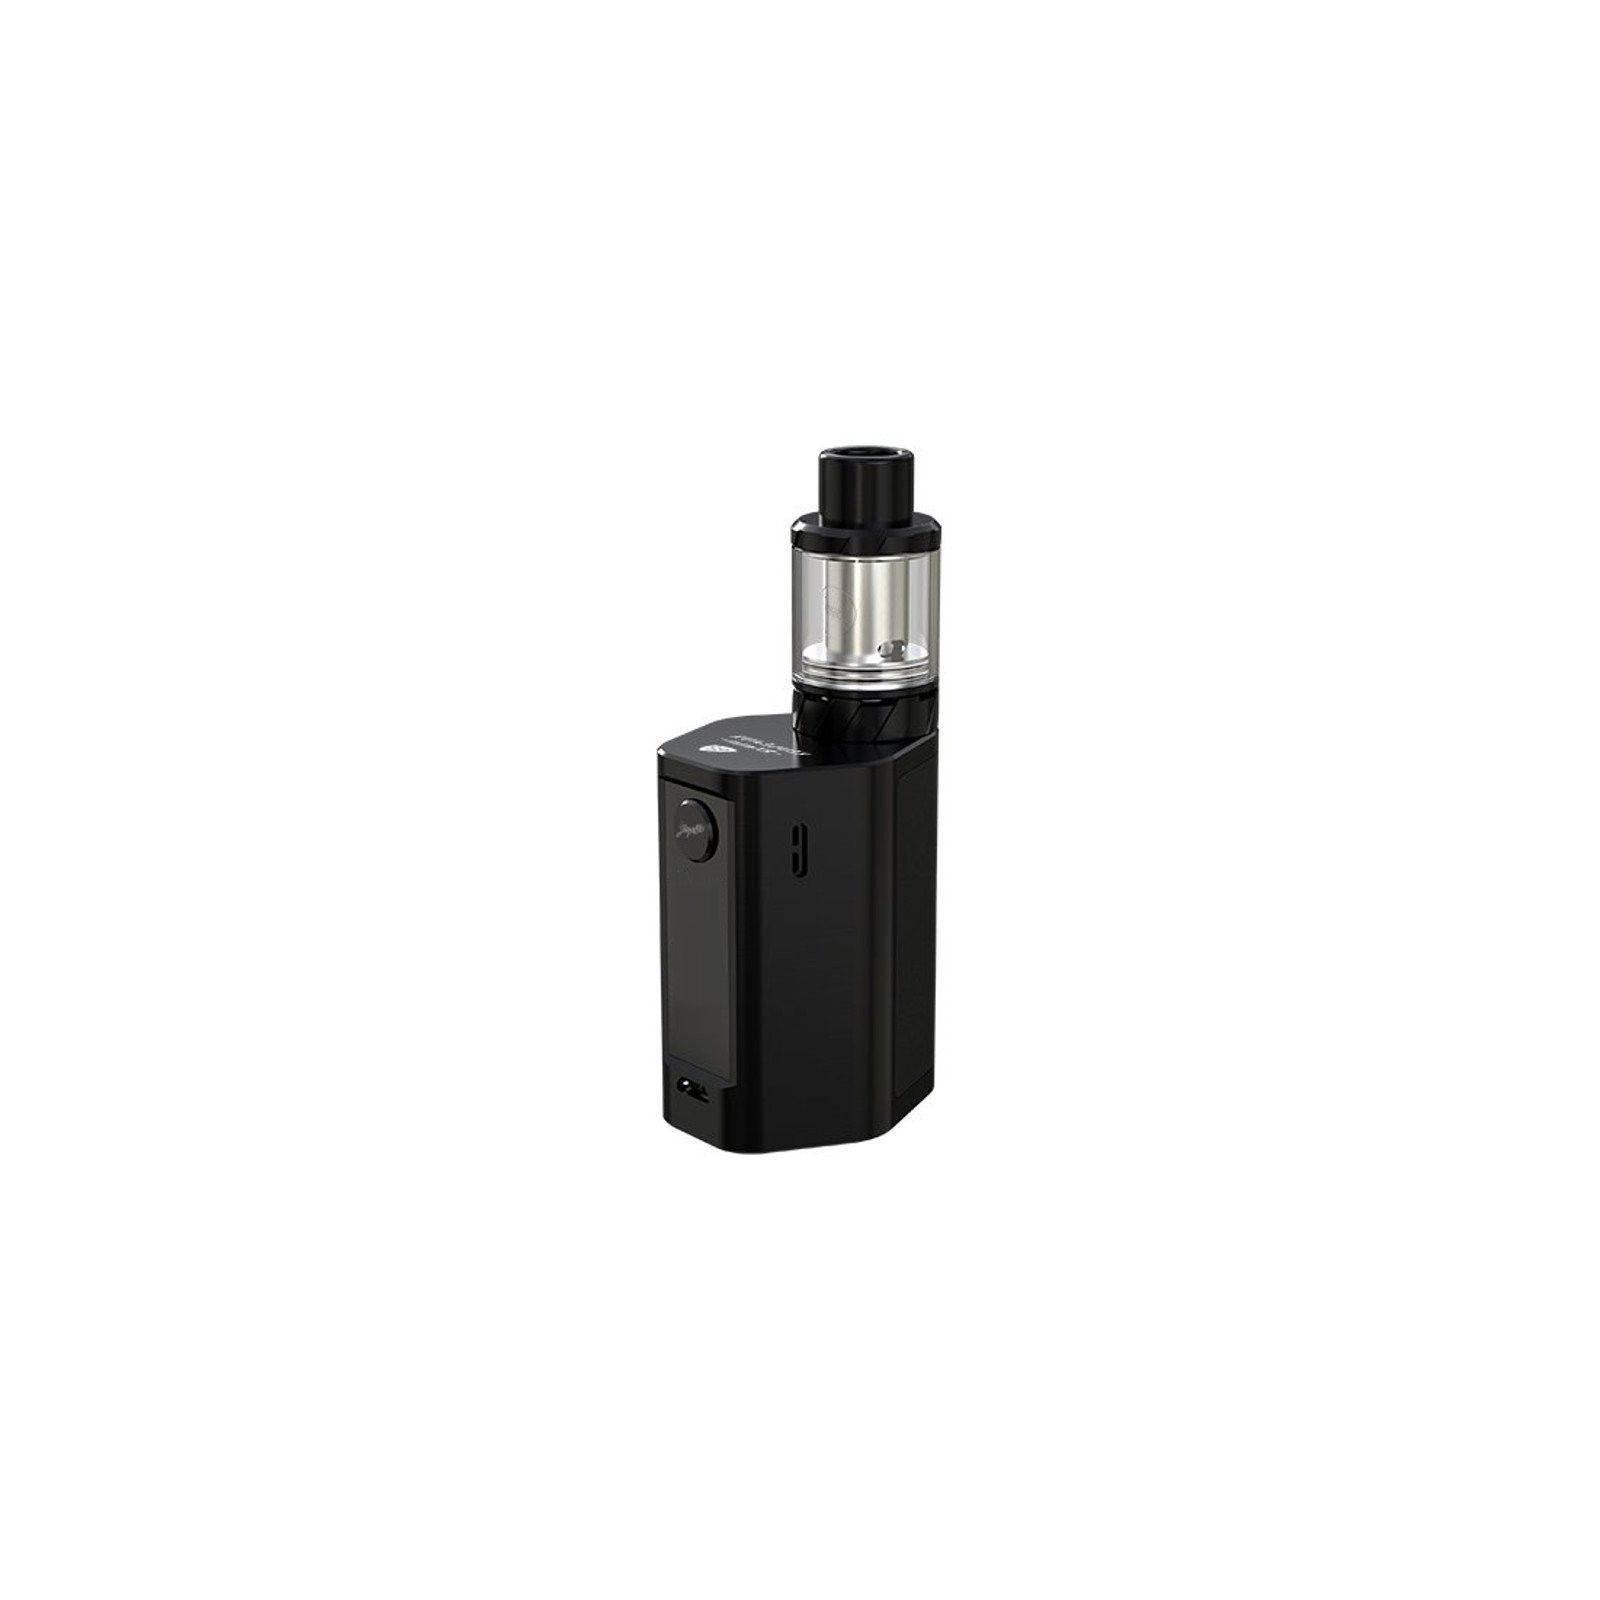 Reuleaux RX Mini kit - WISMEC